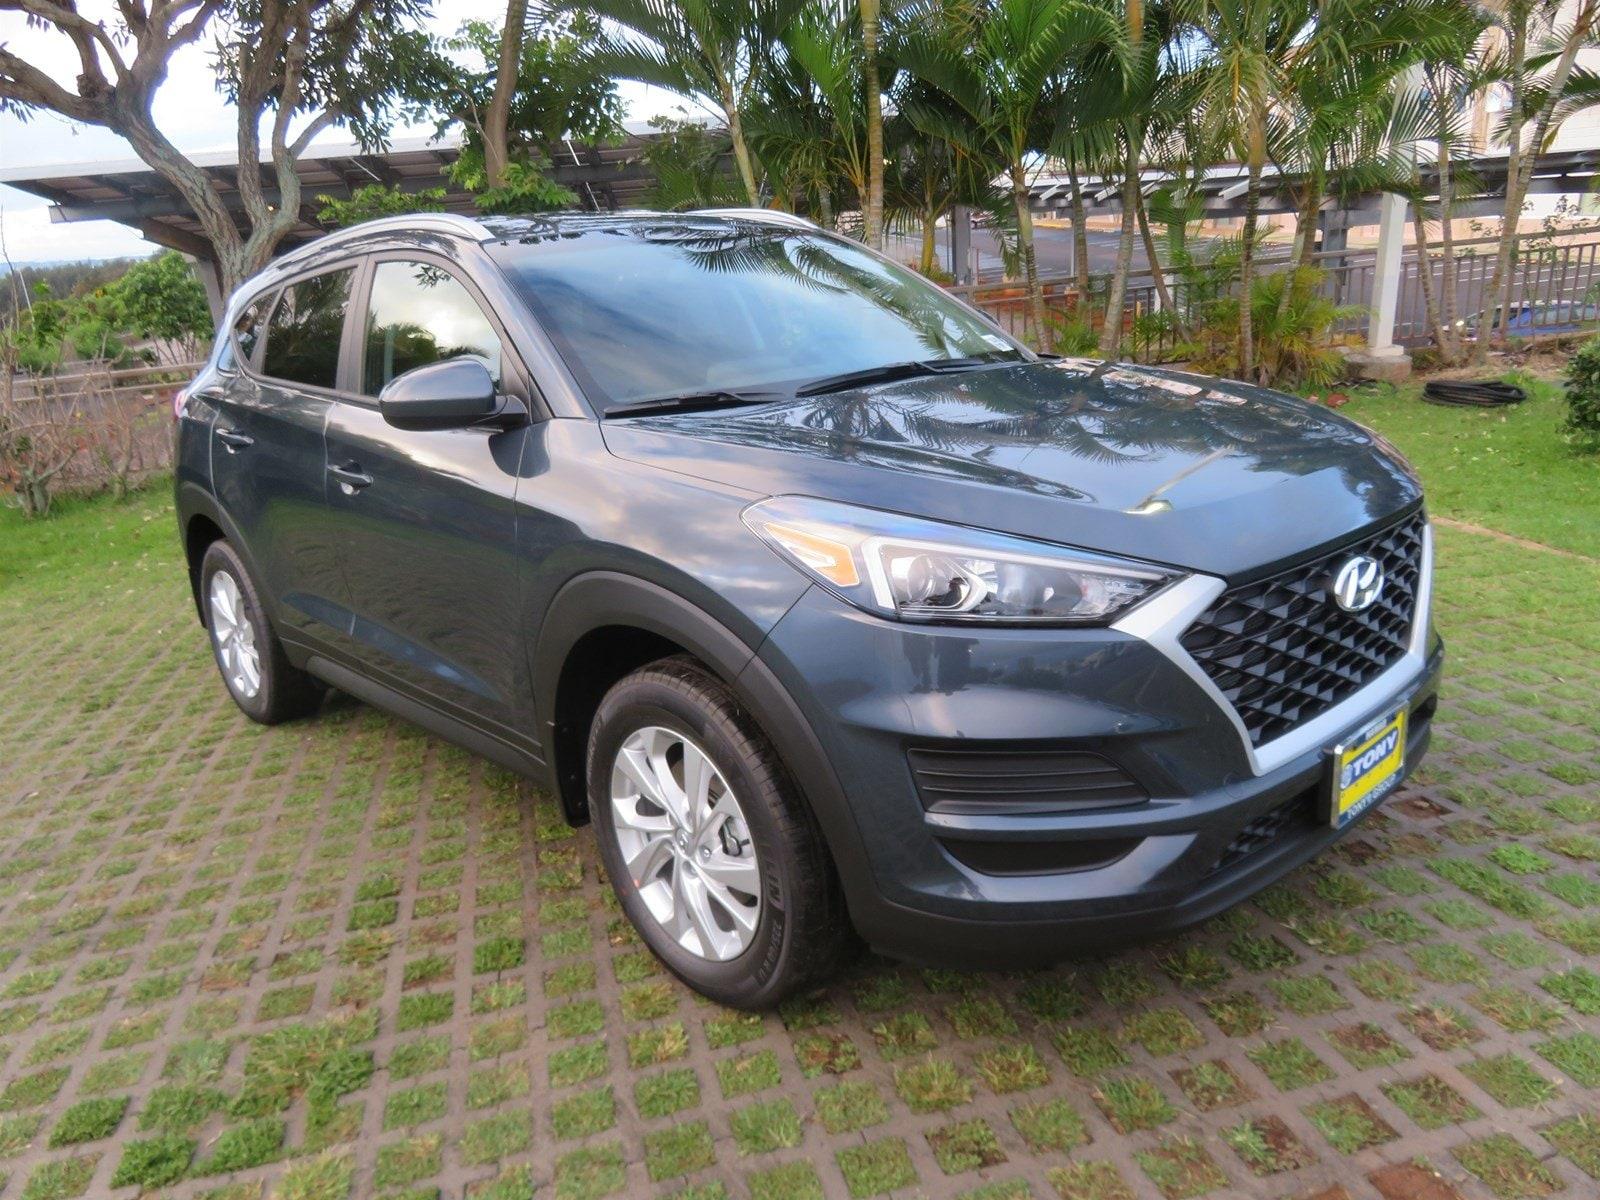 New 2019 Hyundai Tucson Value For Sale in Waipahu HI   VIN:  KM8J3CA46KU961496